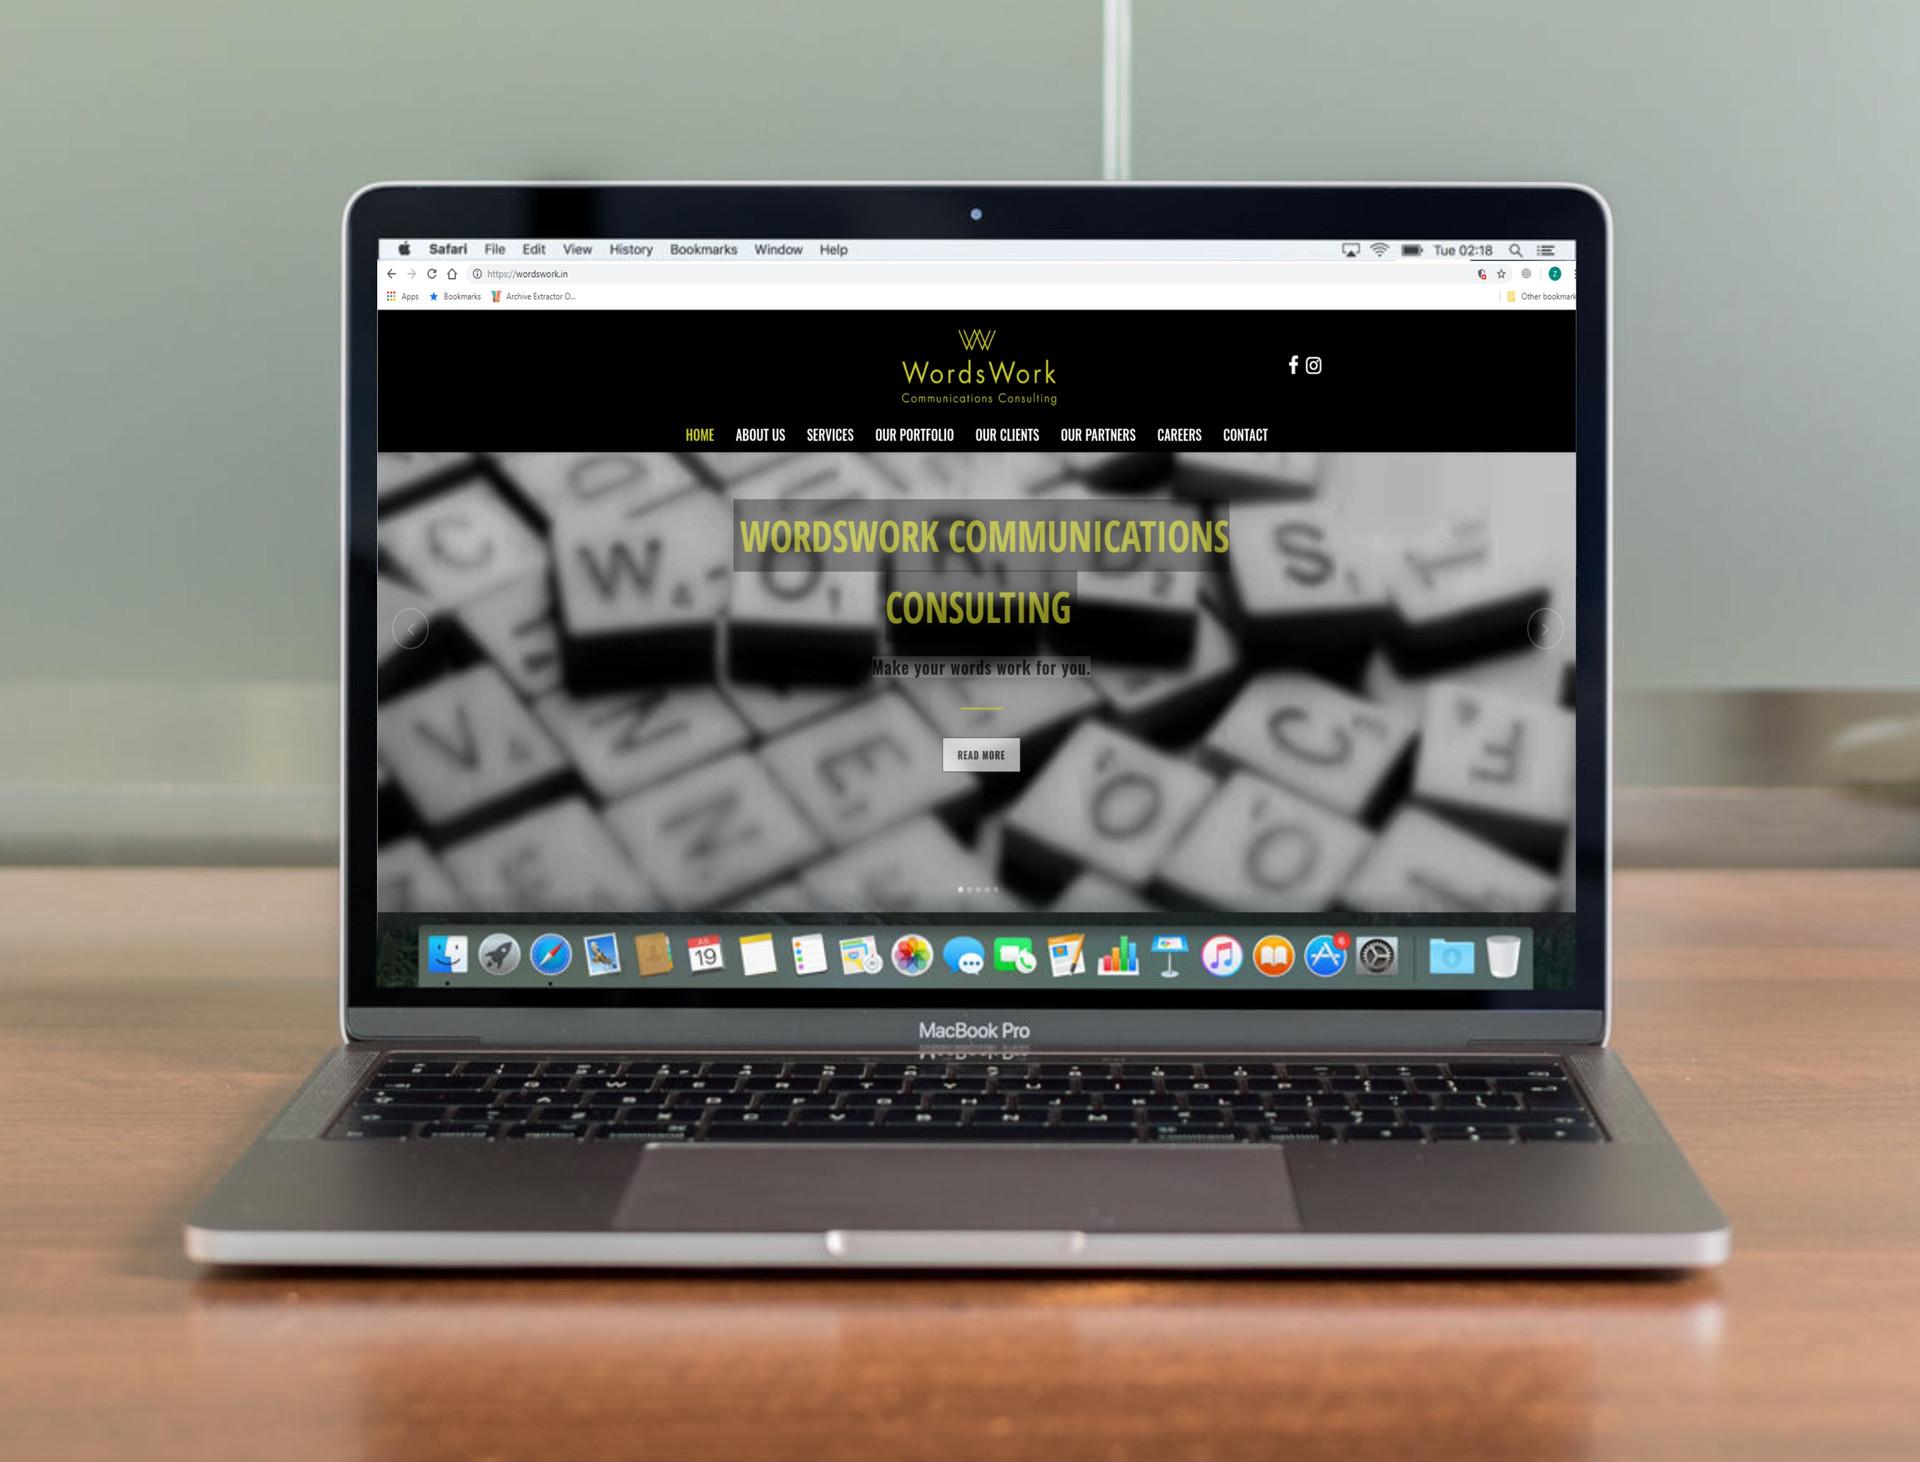 Mockup Mac Pro Dummy.jpg